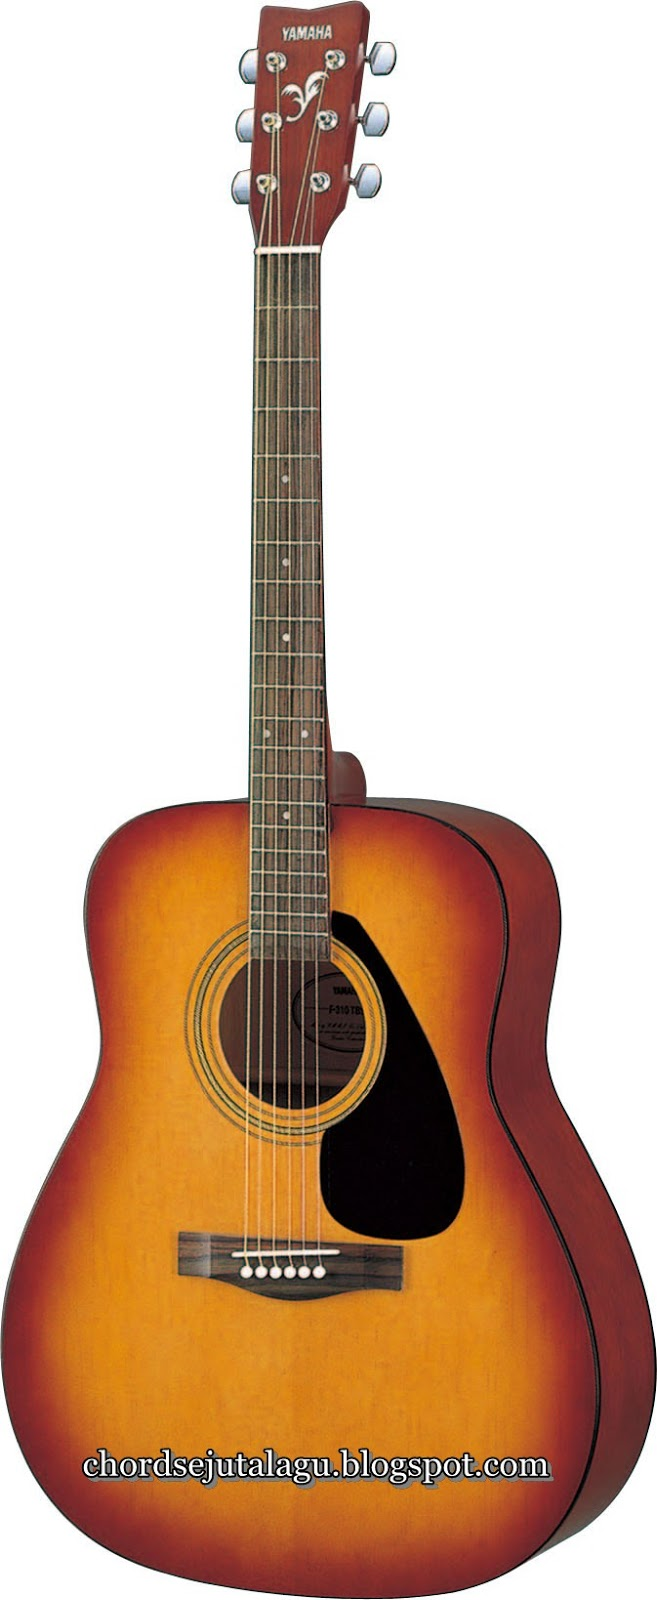 Spesifikasi Dan Harga Gitar Akustik Yamaha F310